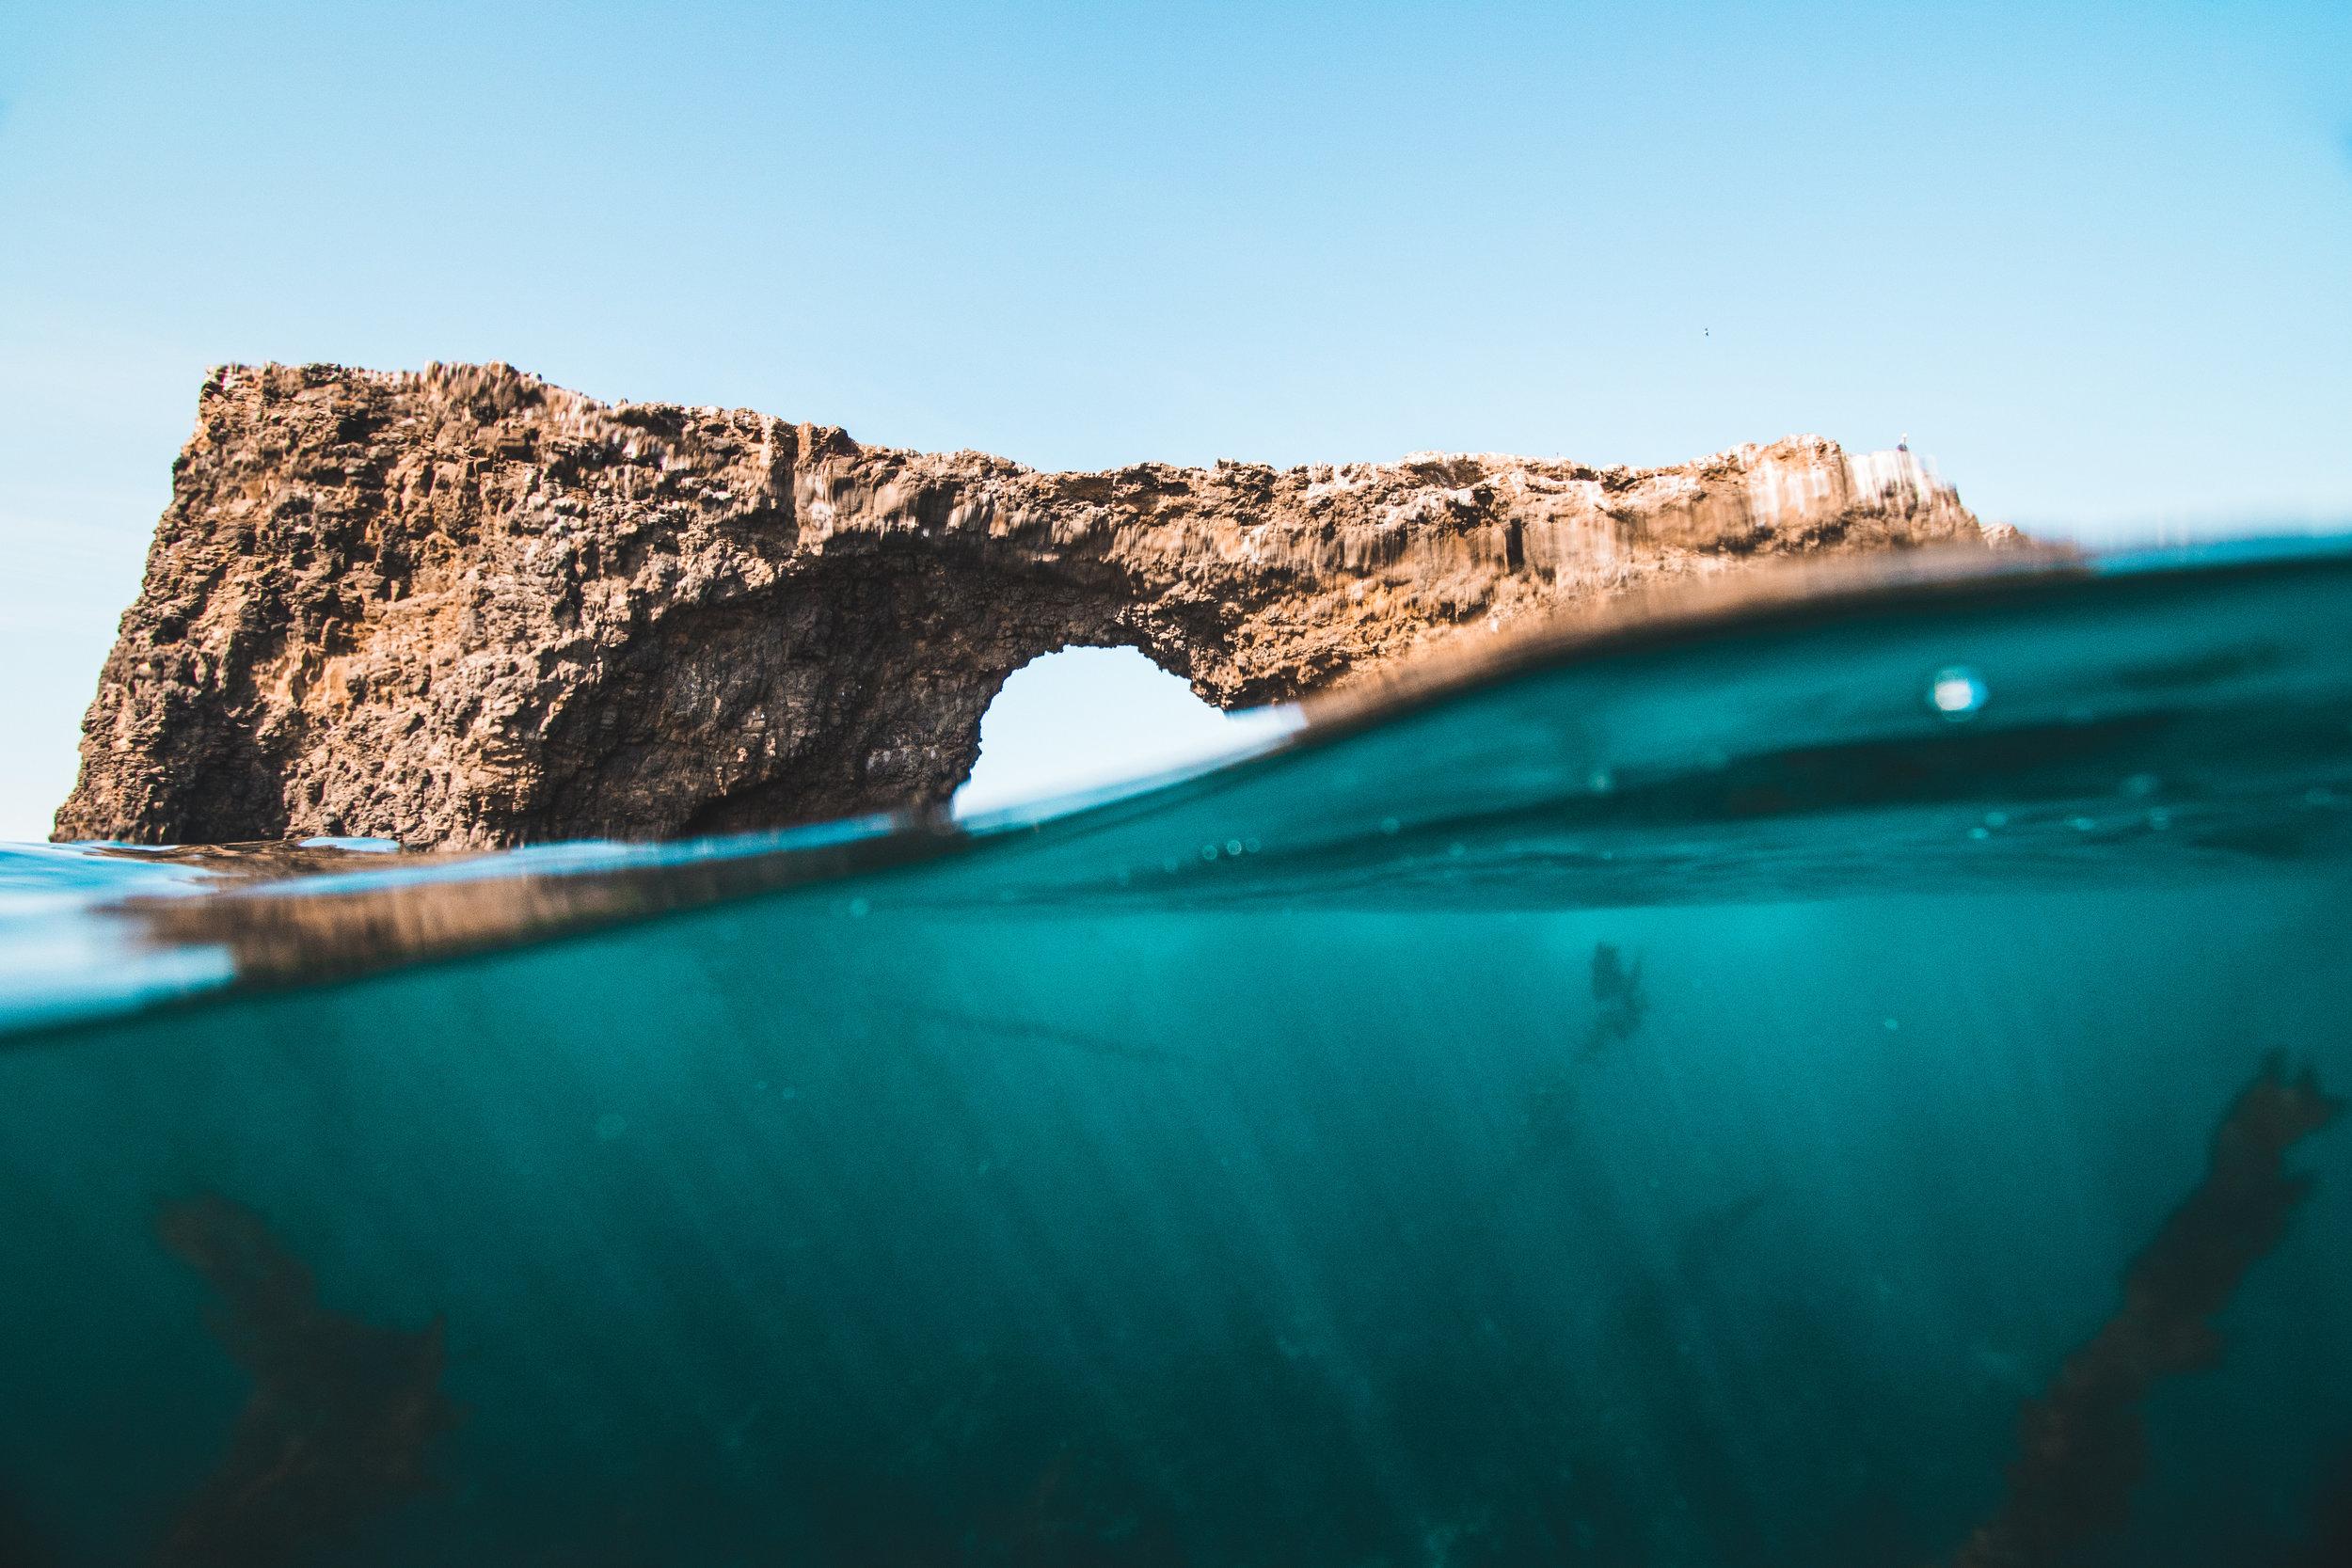 anacapa island water (27 of 48).jpg